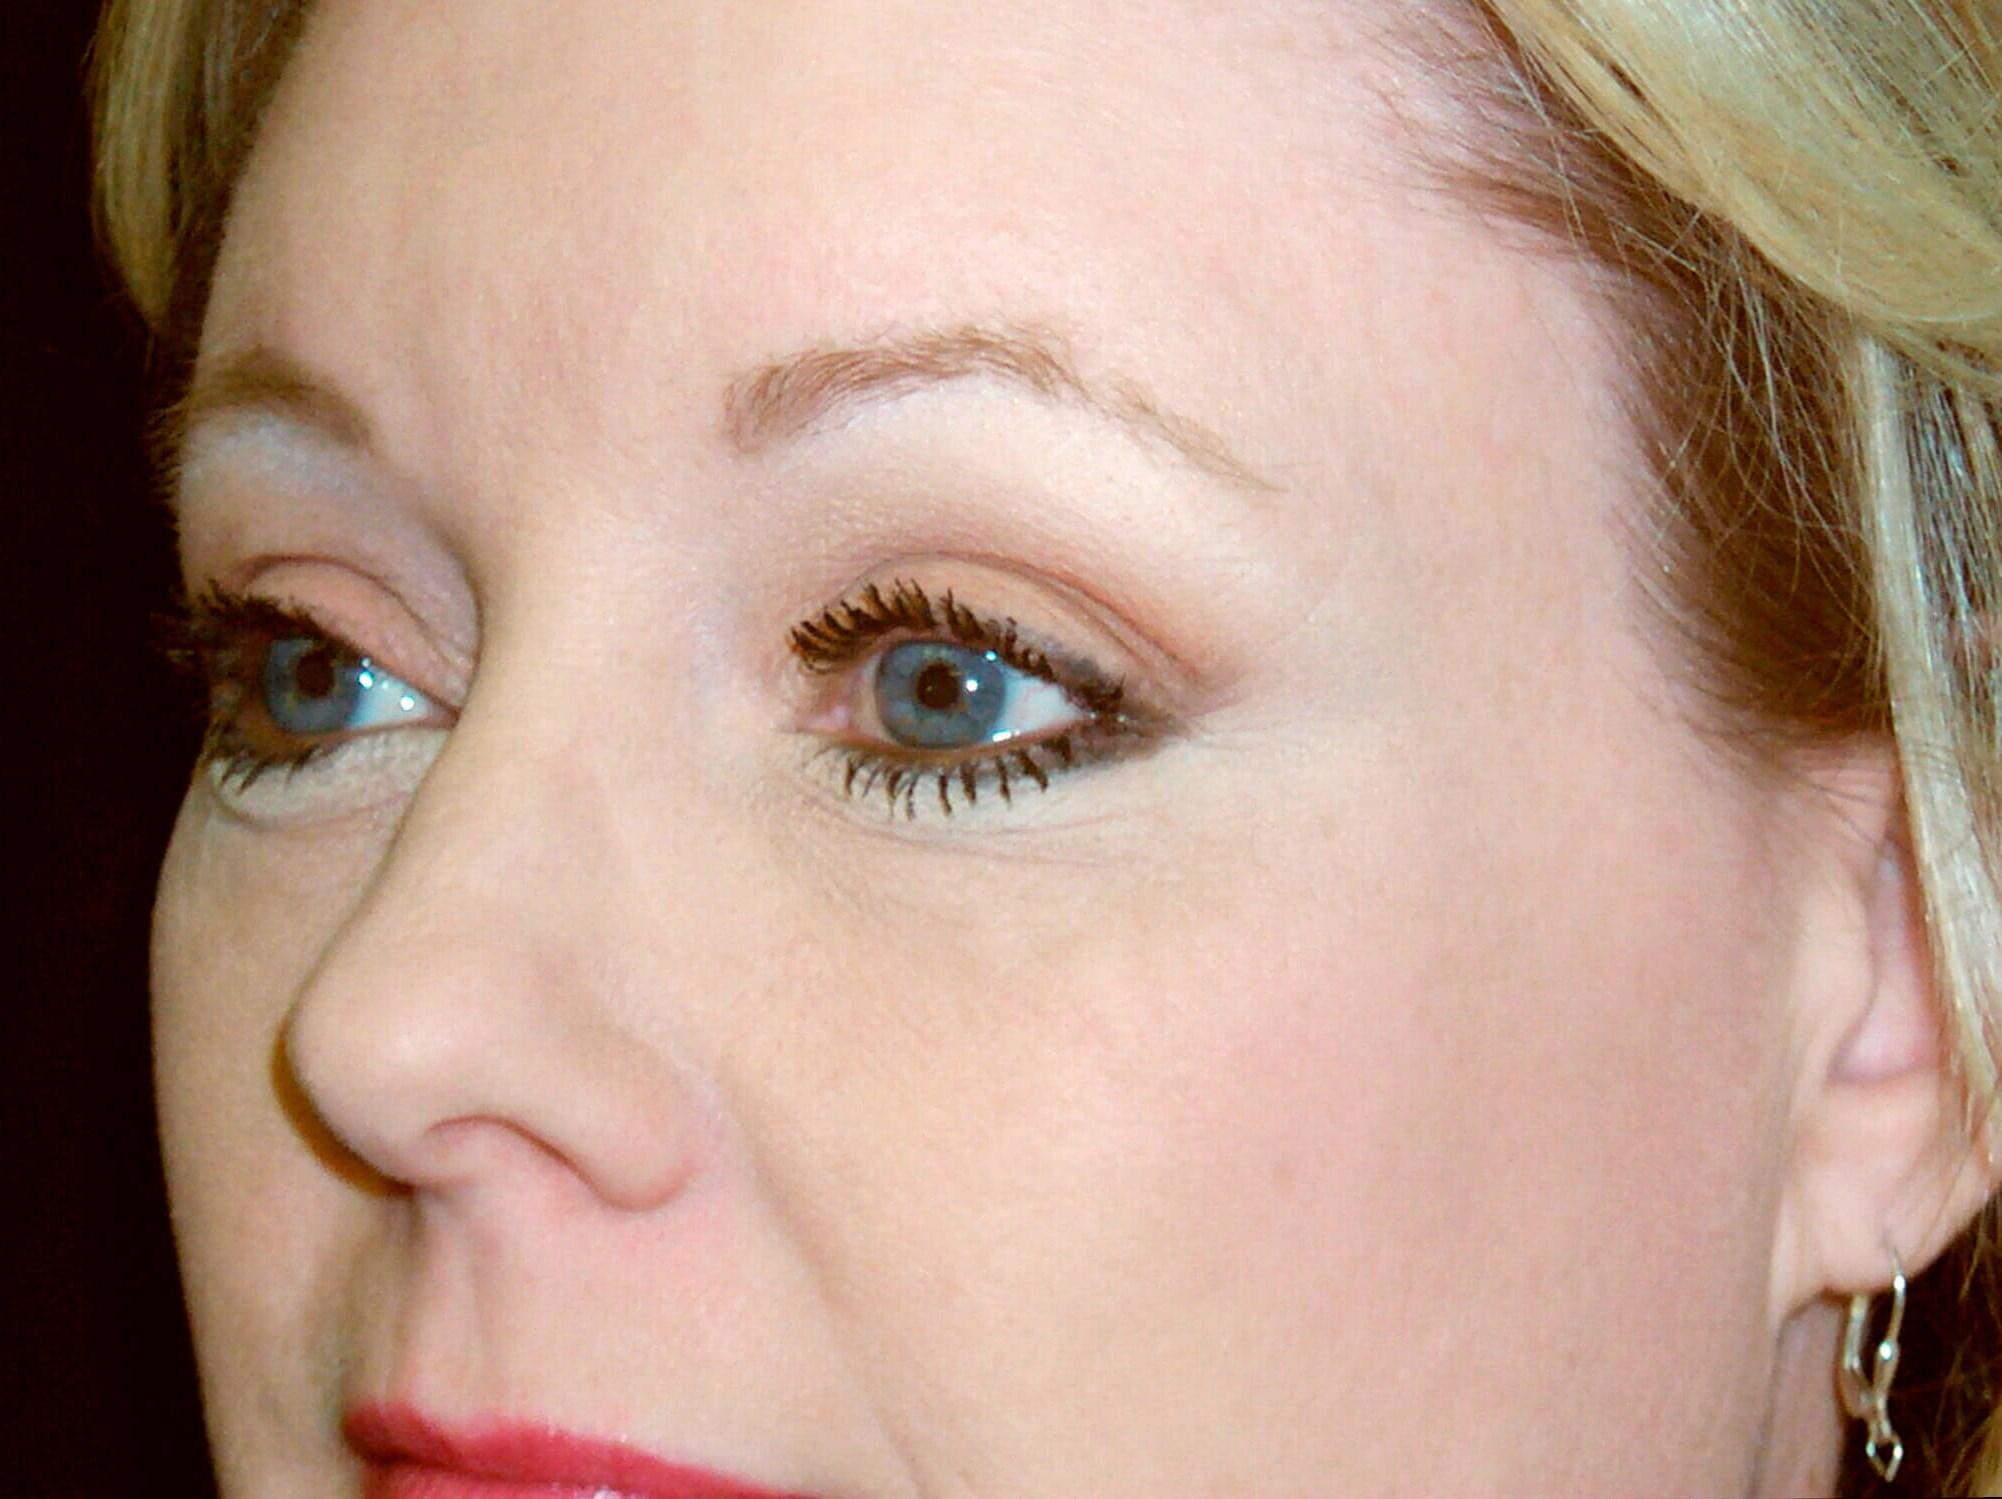 DALLAS, TEXAS WOMAN AWAKENS FACIAL EXPRESSION WITH BROW LIFT PROCEDURE